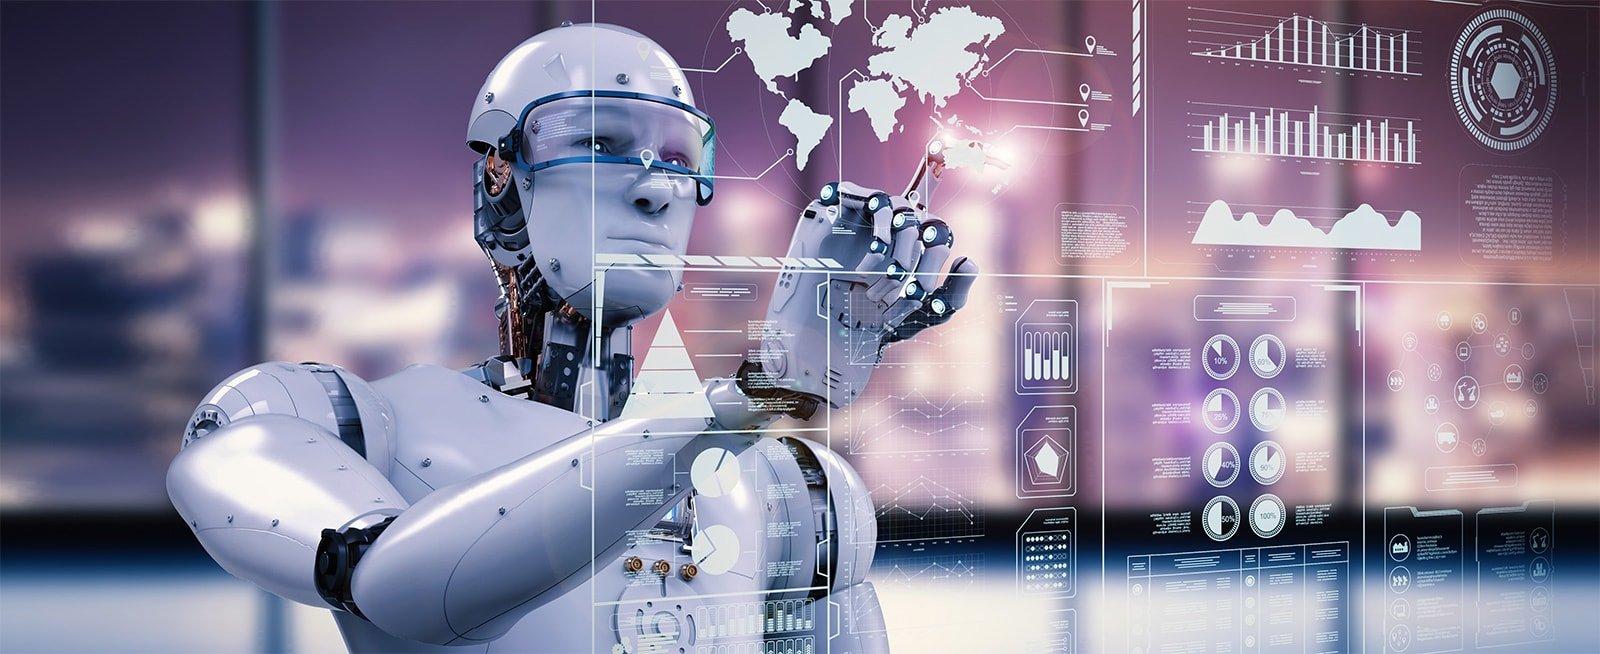 Should I Use Forex Trading Robots to Trade? - Oasdom